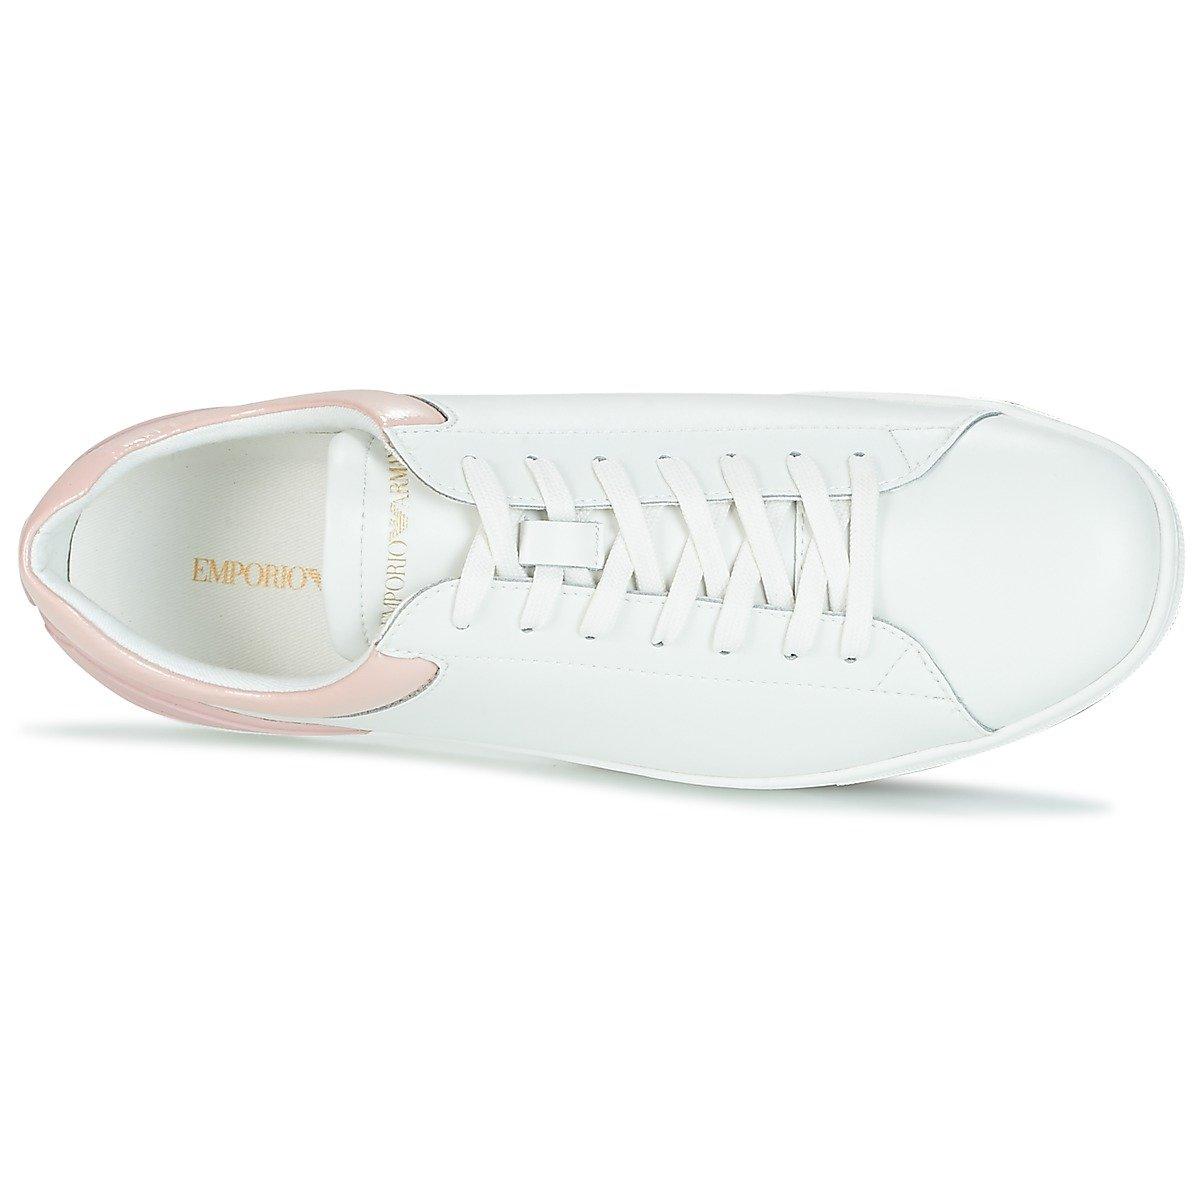 Emporio Emporio Emporio Armani Heel Logo Court Damen Turnschuhe Weiß 1ae18a